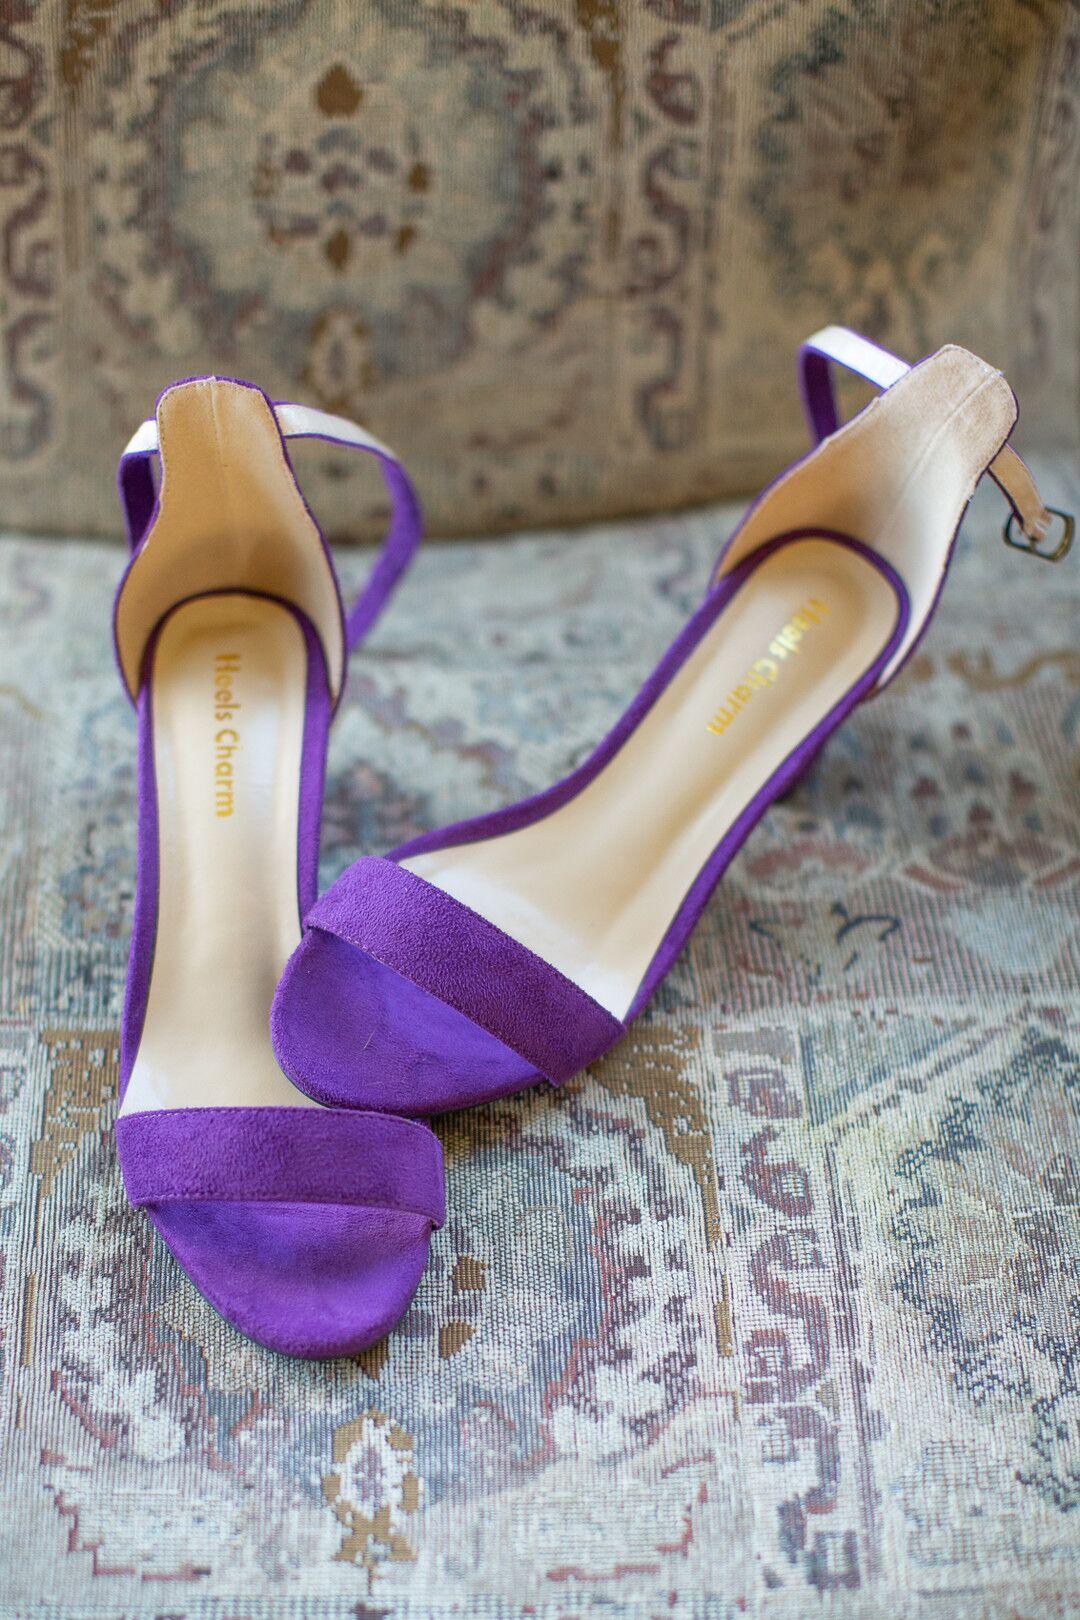 www.santabarbarawedding.com | Venue: The Casitas of Arroyo Grande | Photographer: Renoda Campbell Photography | Second Shooter: John Patrick Images |  Purple Bridal Shoes